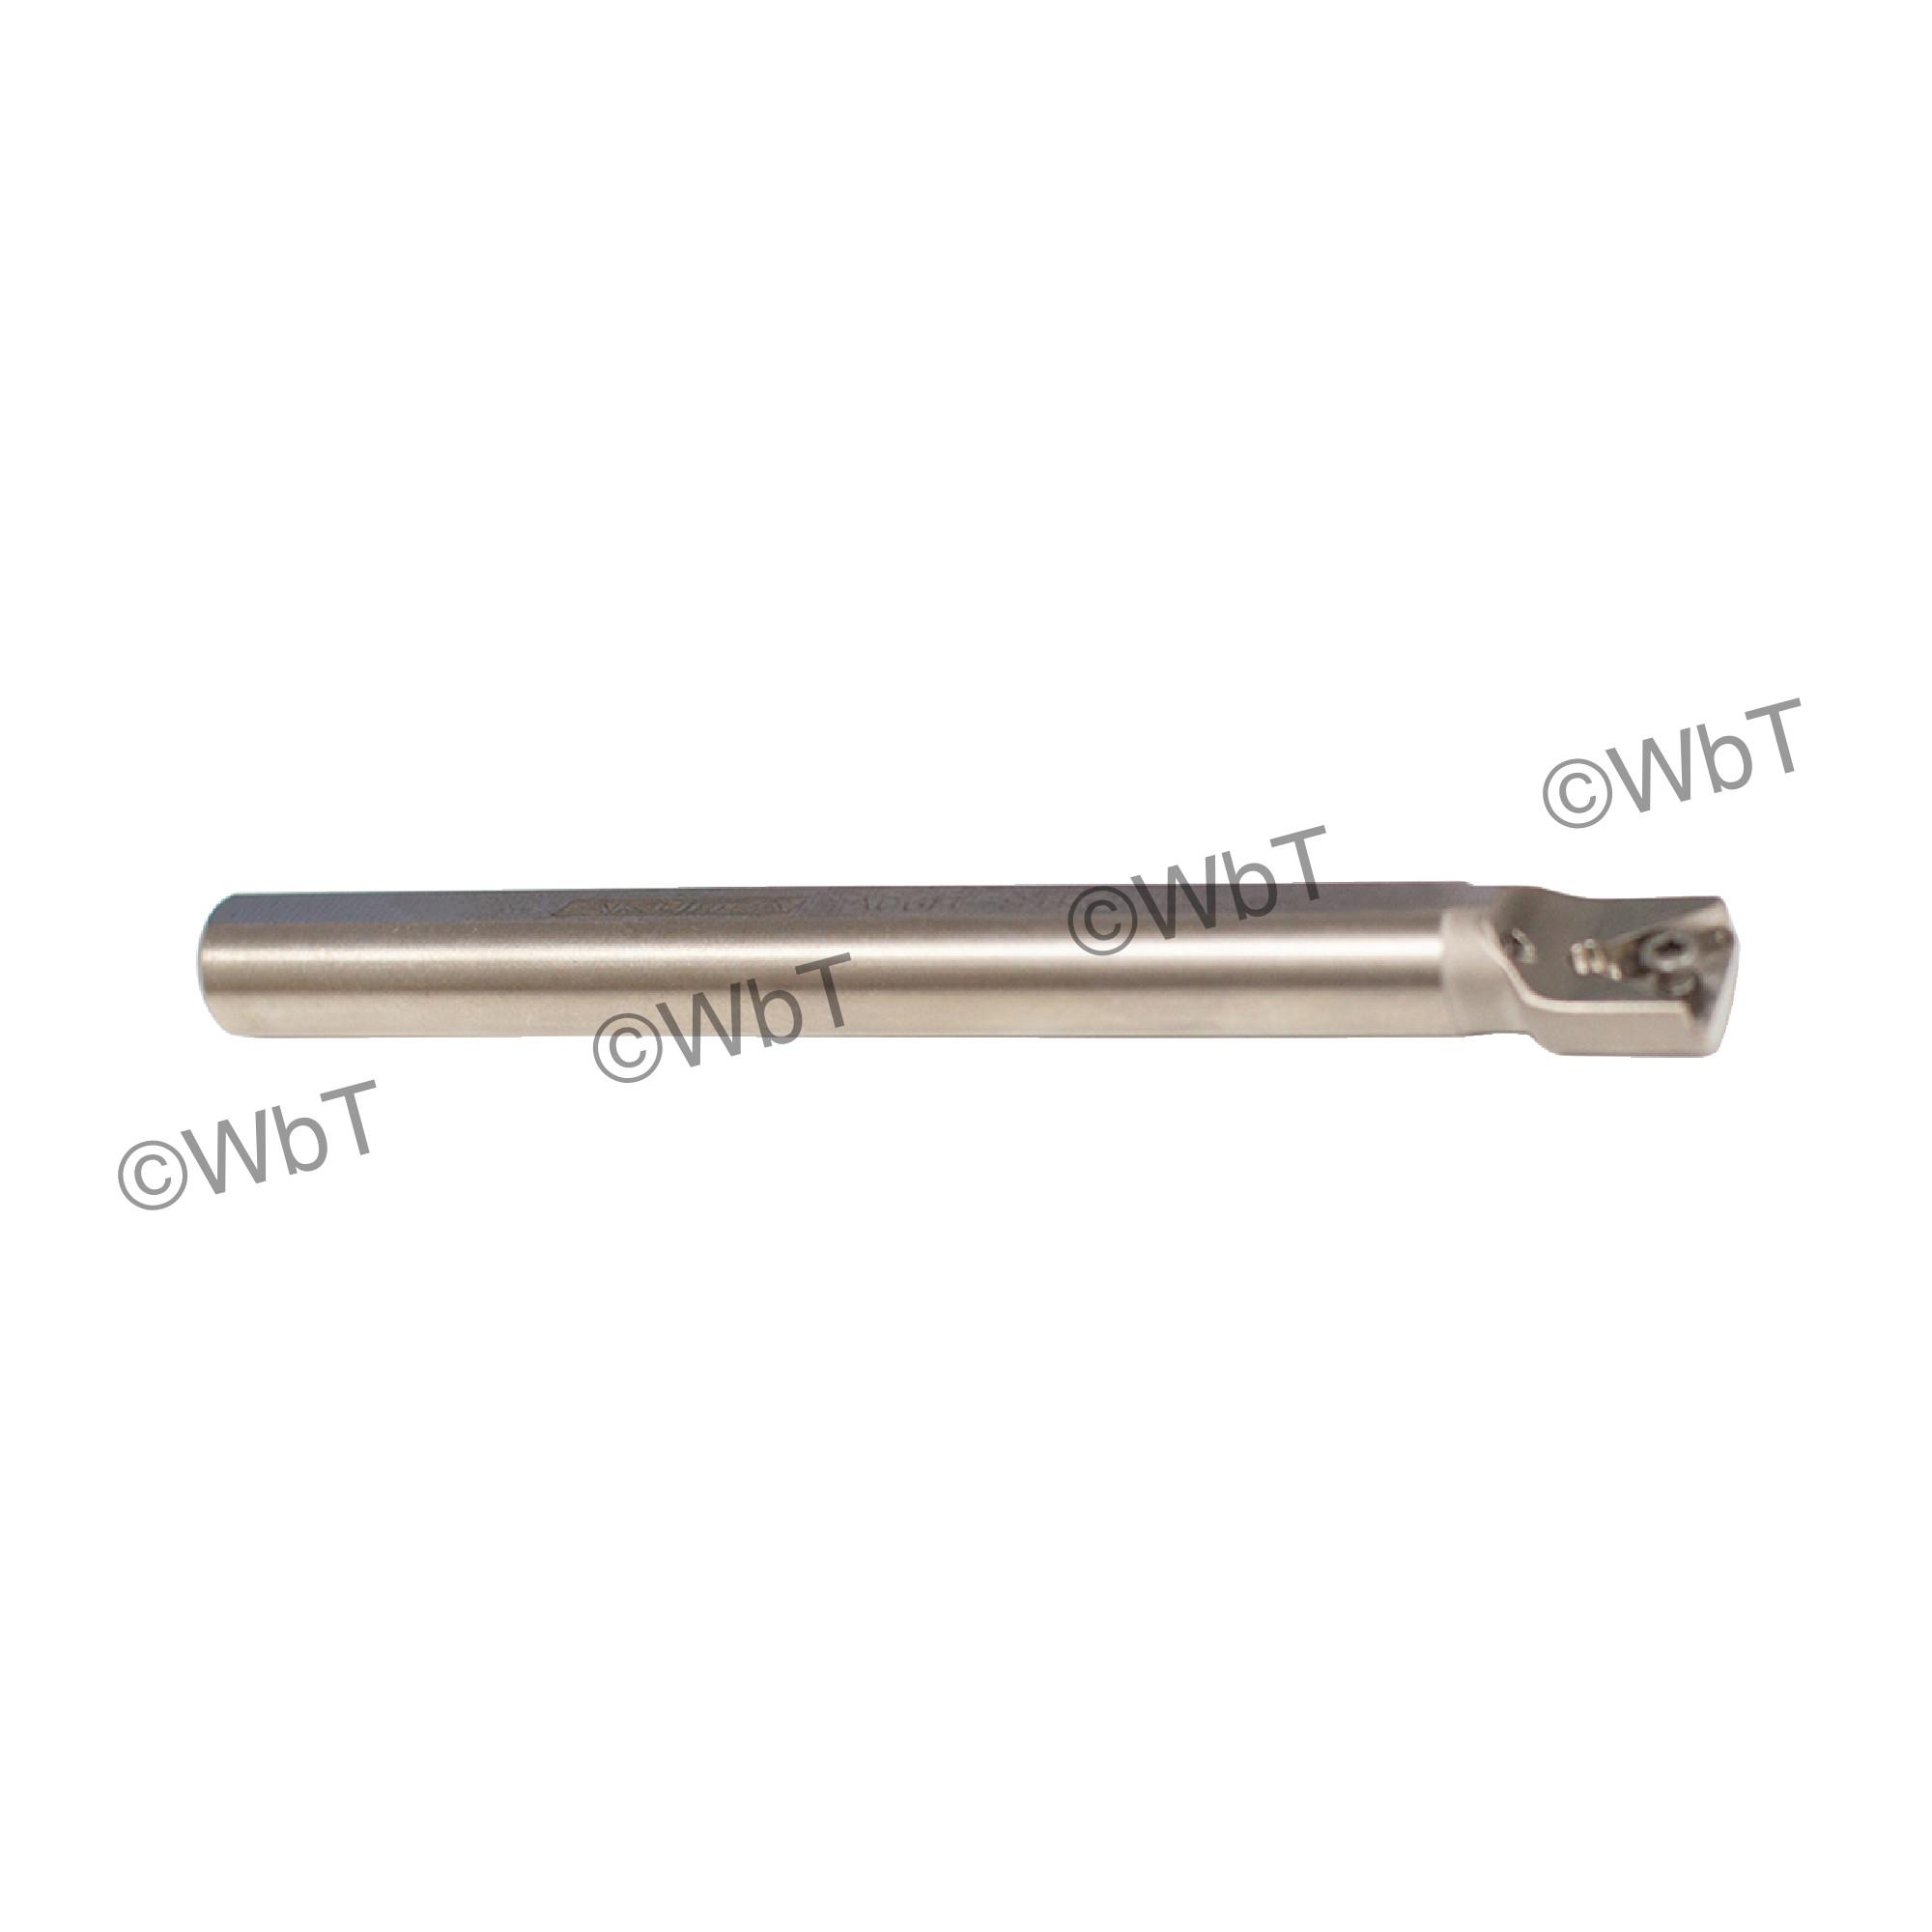 "AKUMA - A06H-STFCL-2 / Steel Boring Bar / 3/8"" Shank / TCMT2(1.5)_ / Cooalnt Thru / Left Hand"